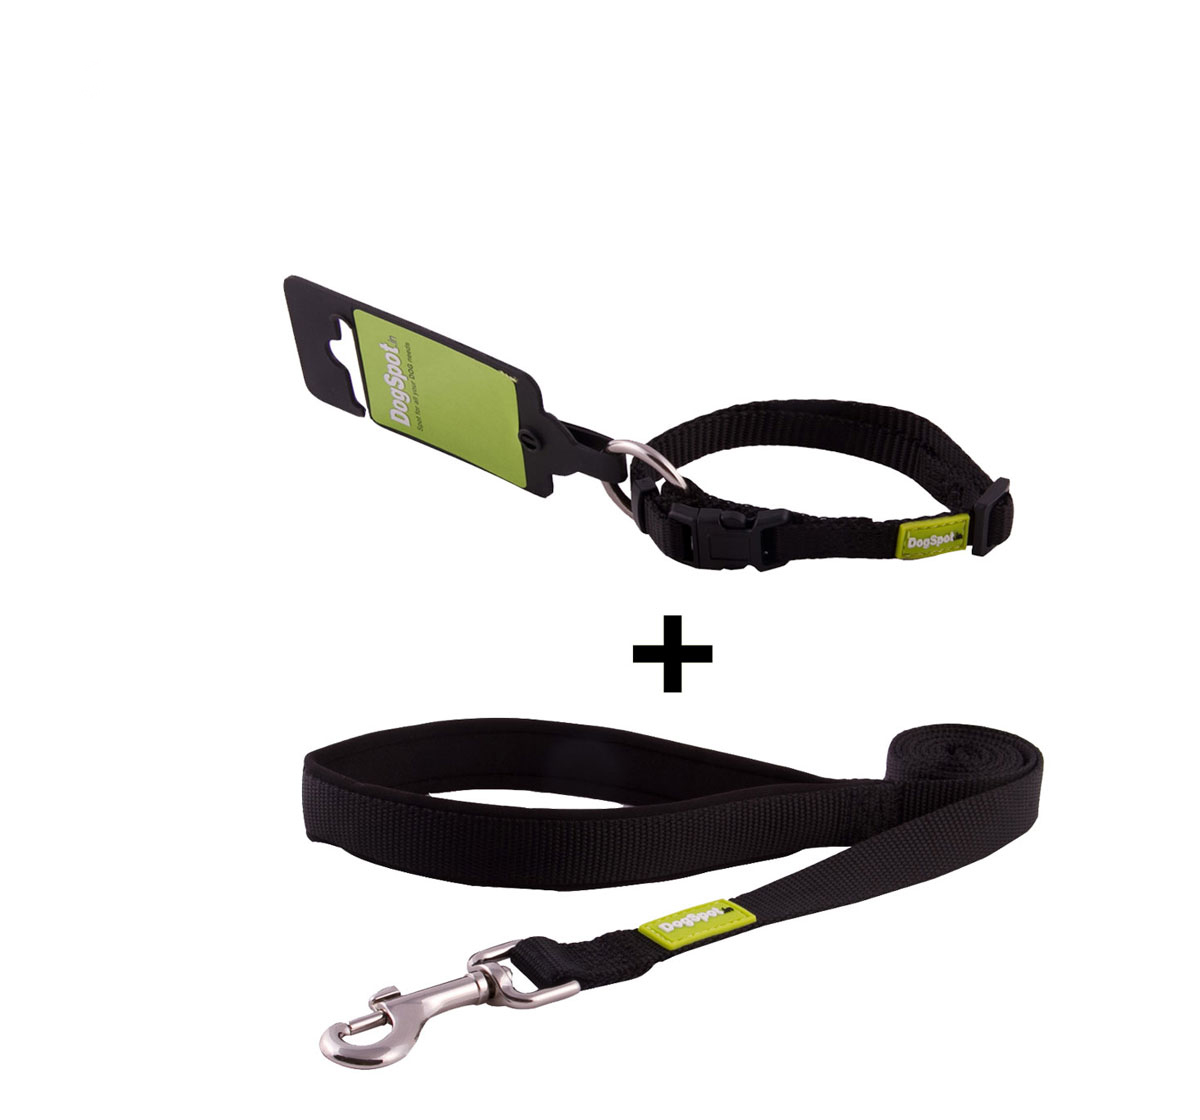 DogSpot Premium Leash and Collar Set Black 10 mm - Large